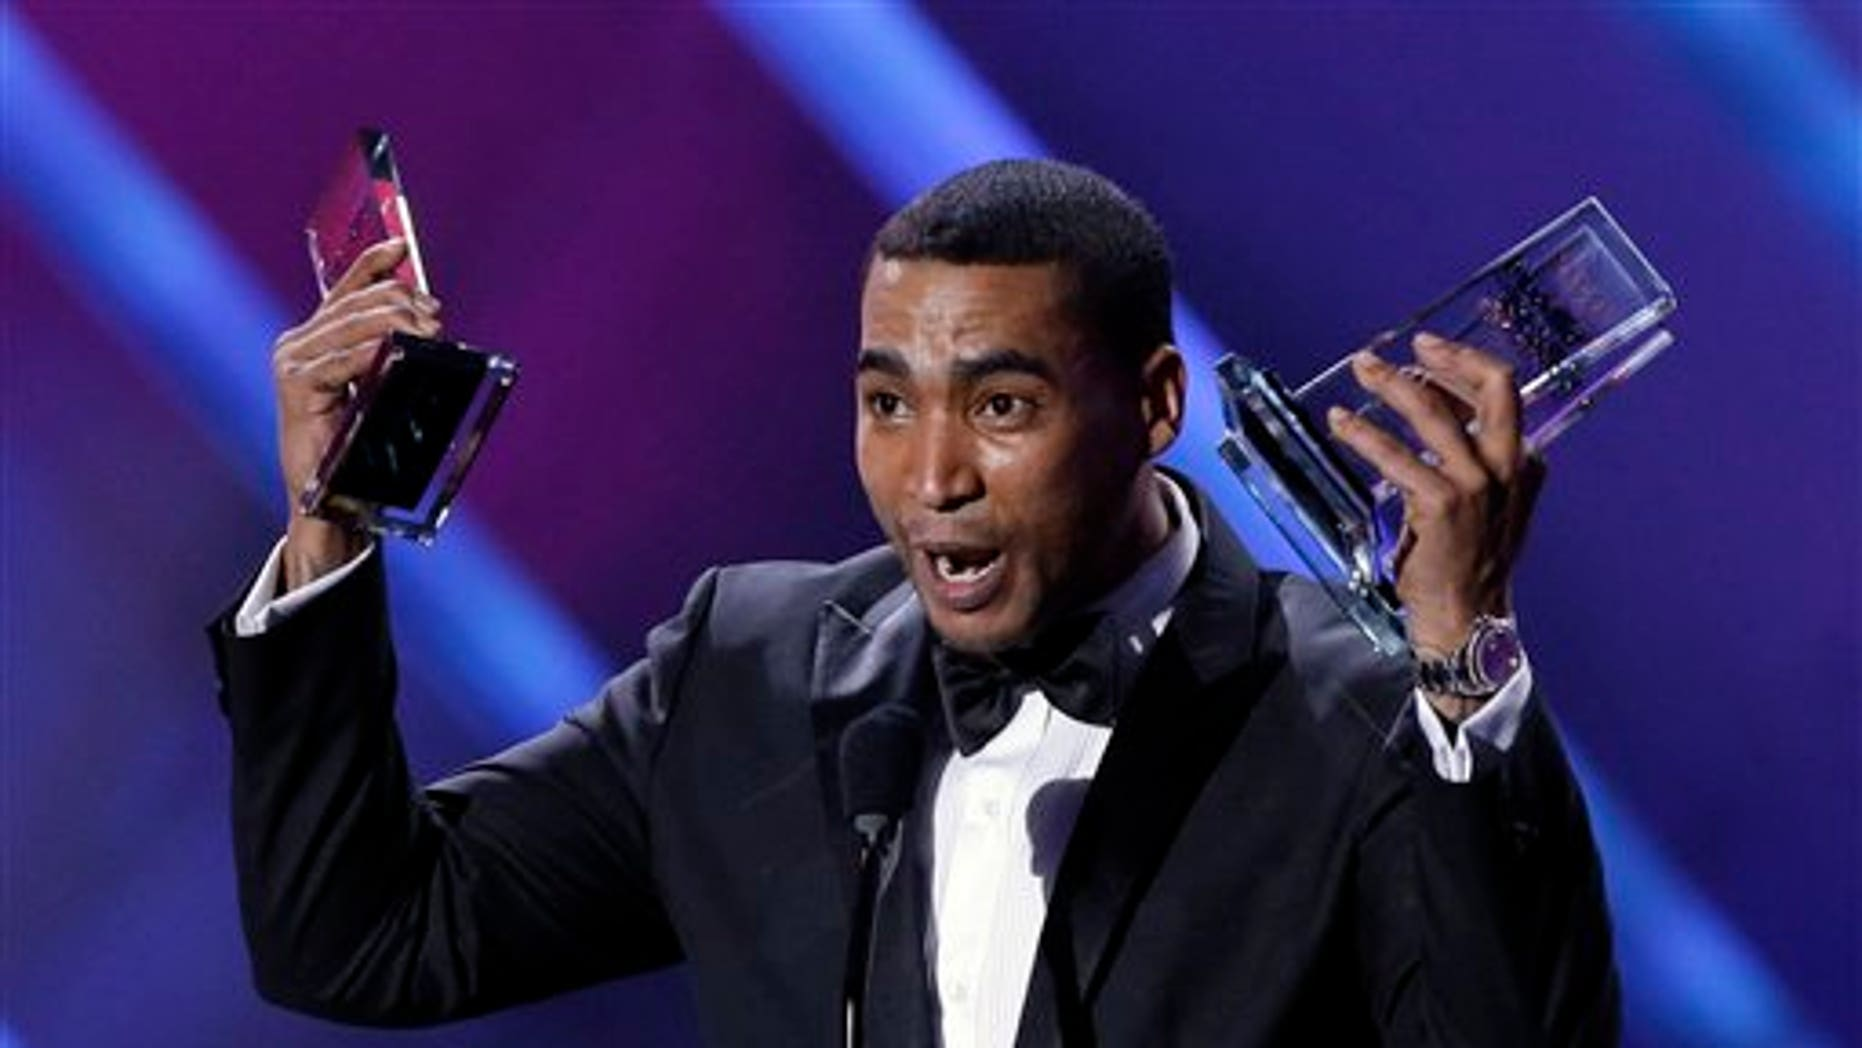 Don Omar receives his tenth award at the Latin Billboard Awards in Coral Gables, Fla, on April 25, 2013.